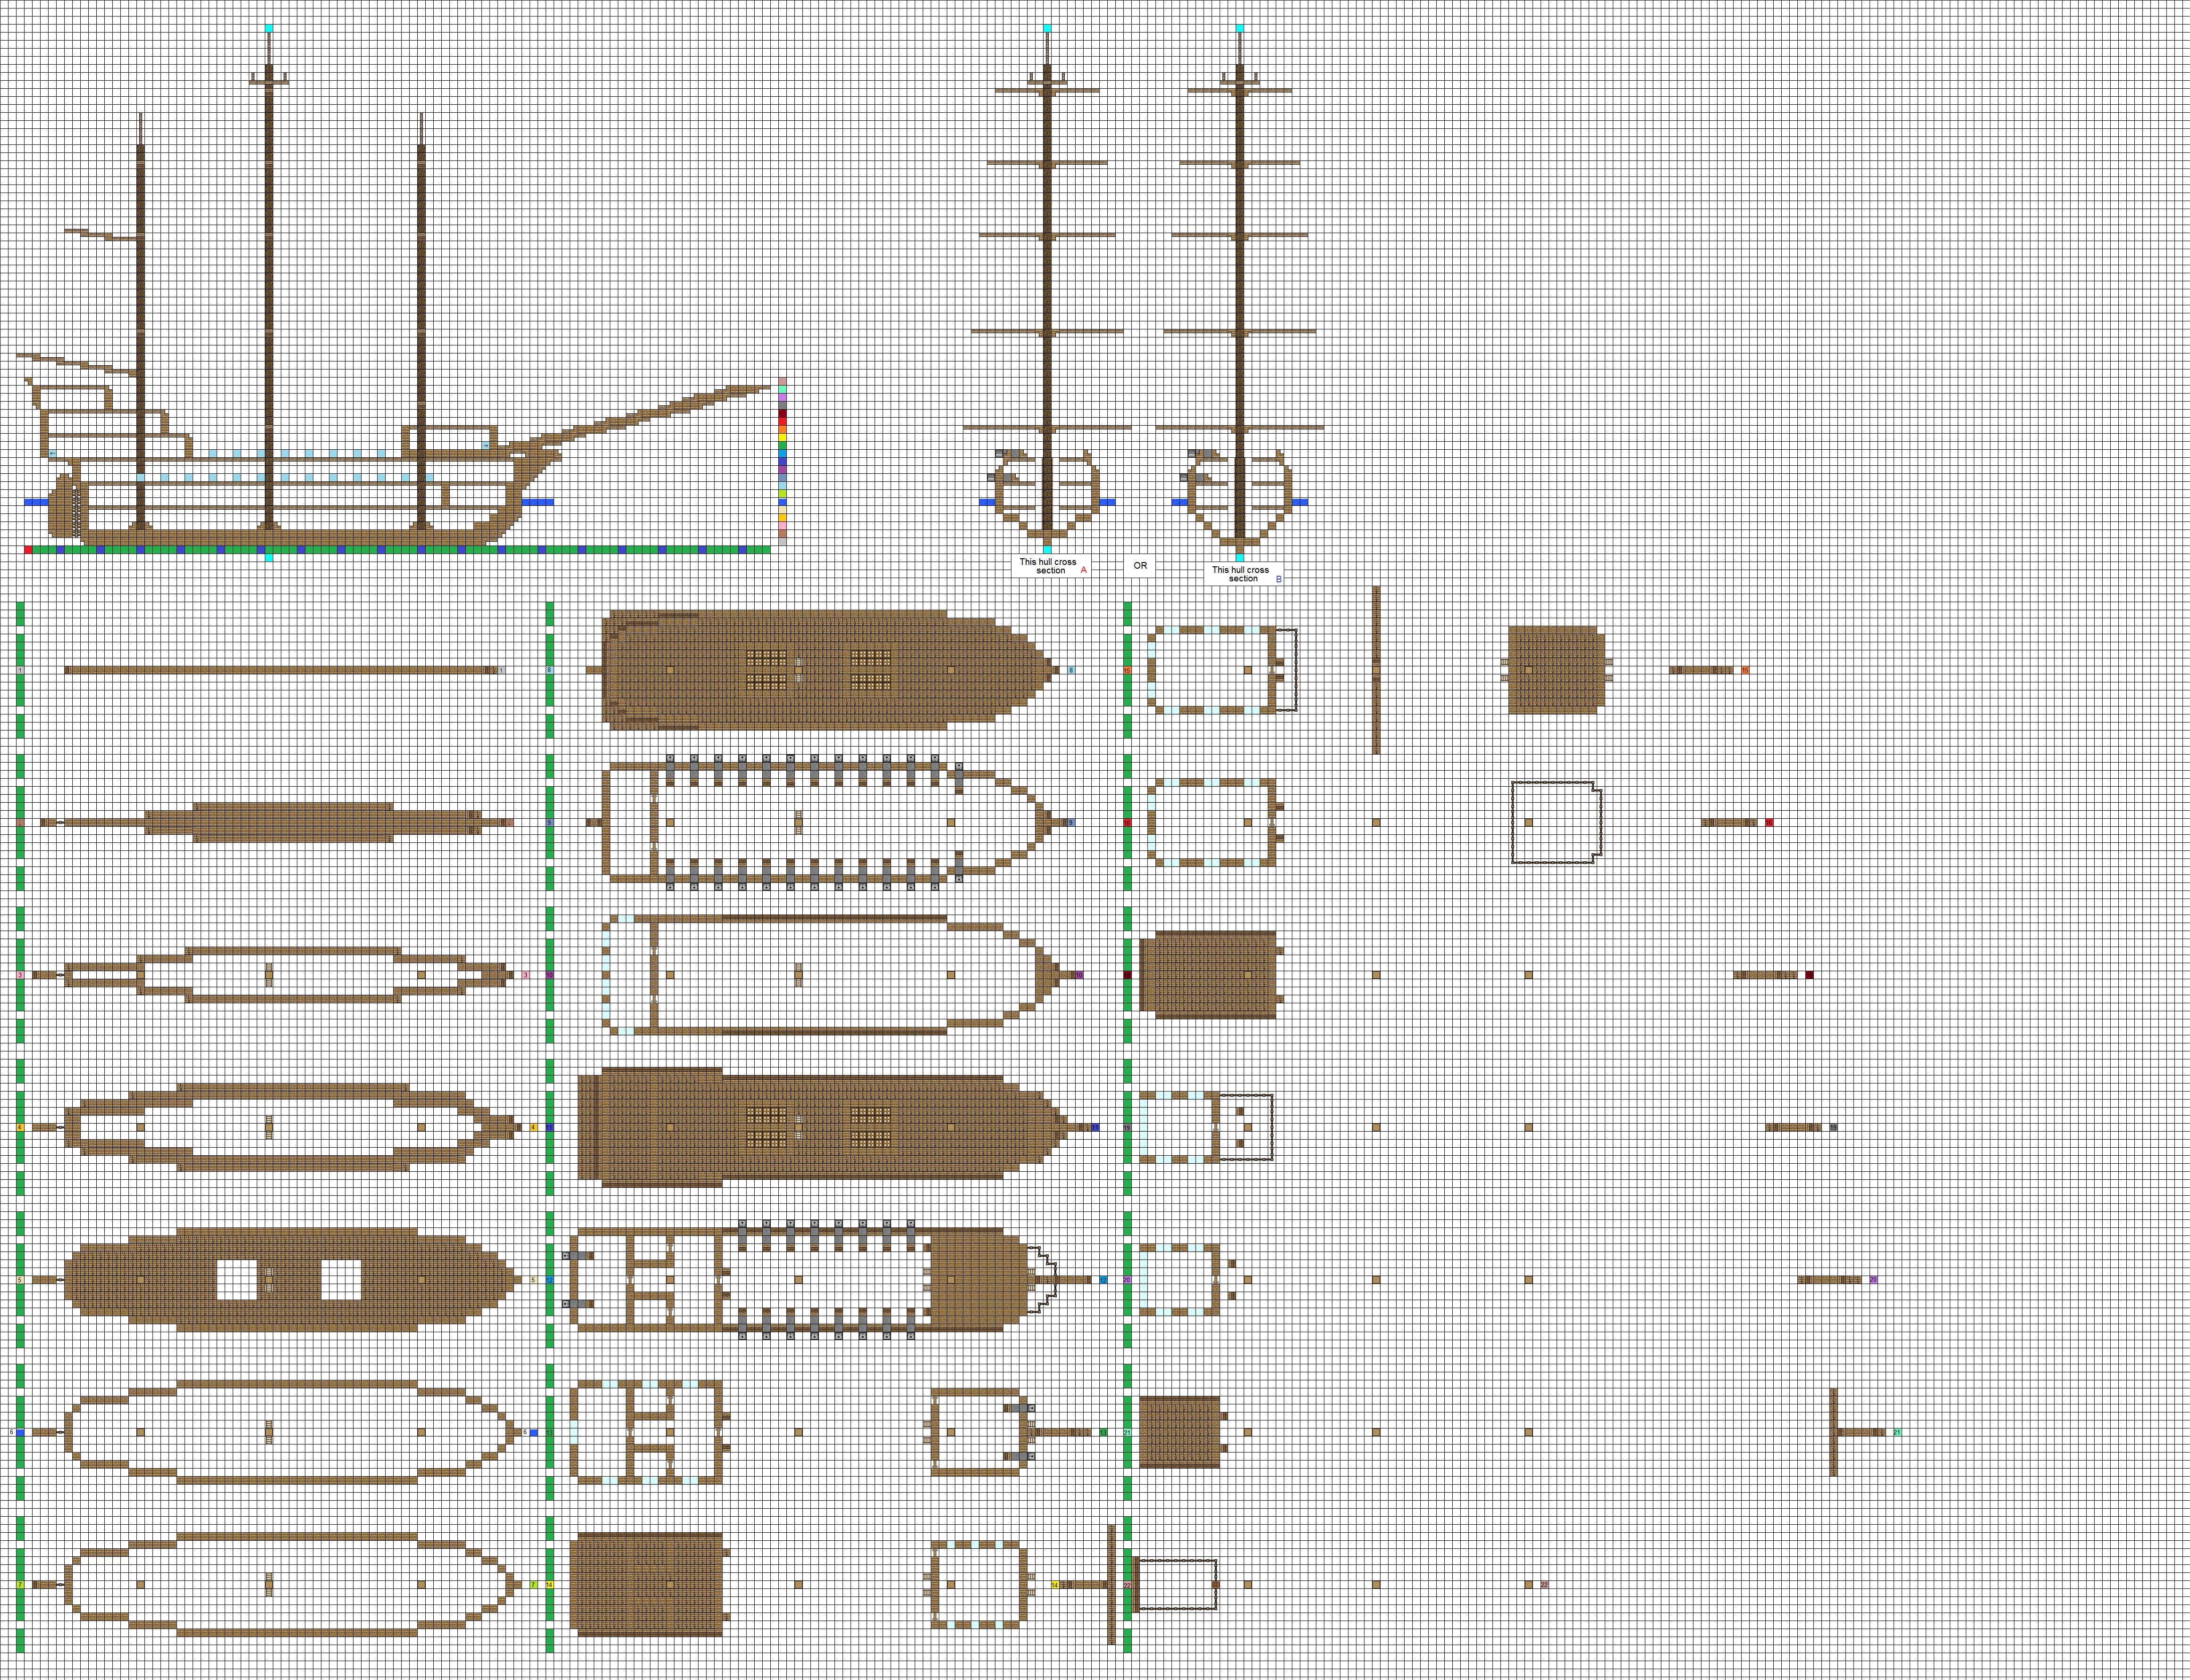 Pirate Ship Blueprints | www.imgkid.com - The Image Kid ...